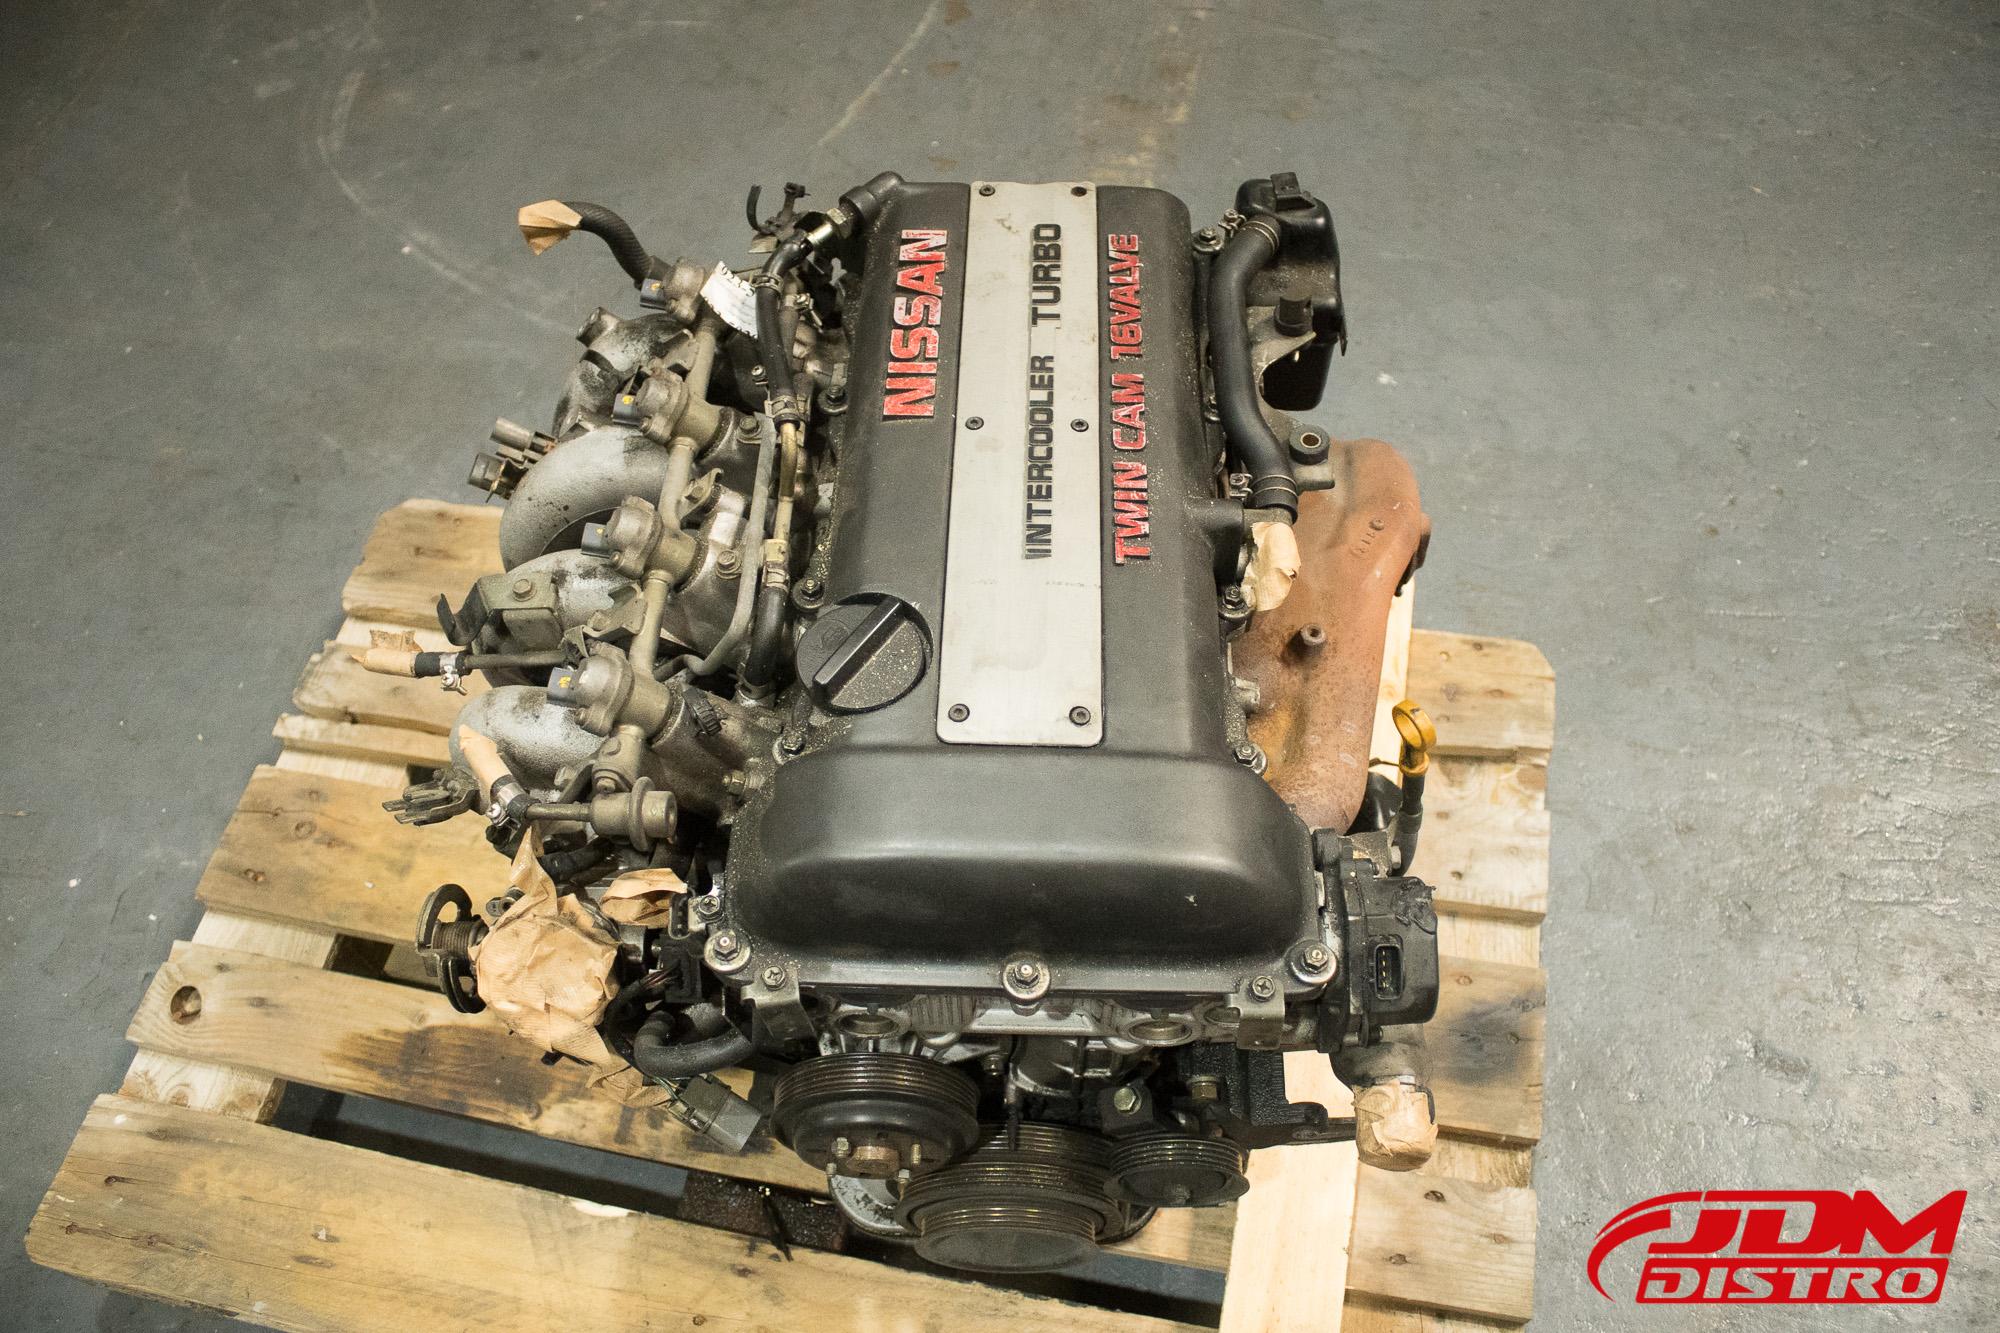 For Nissan Silvia SR20DET Rebuild Head Gasket Kit 240SX SR20 S13 Redtop Blacktop